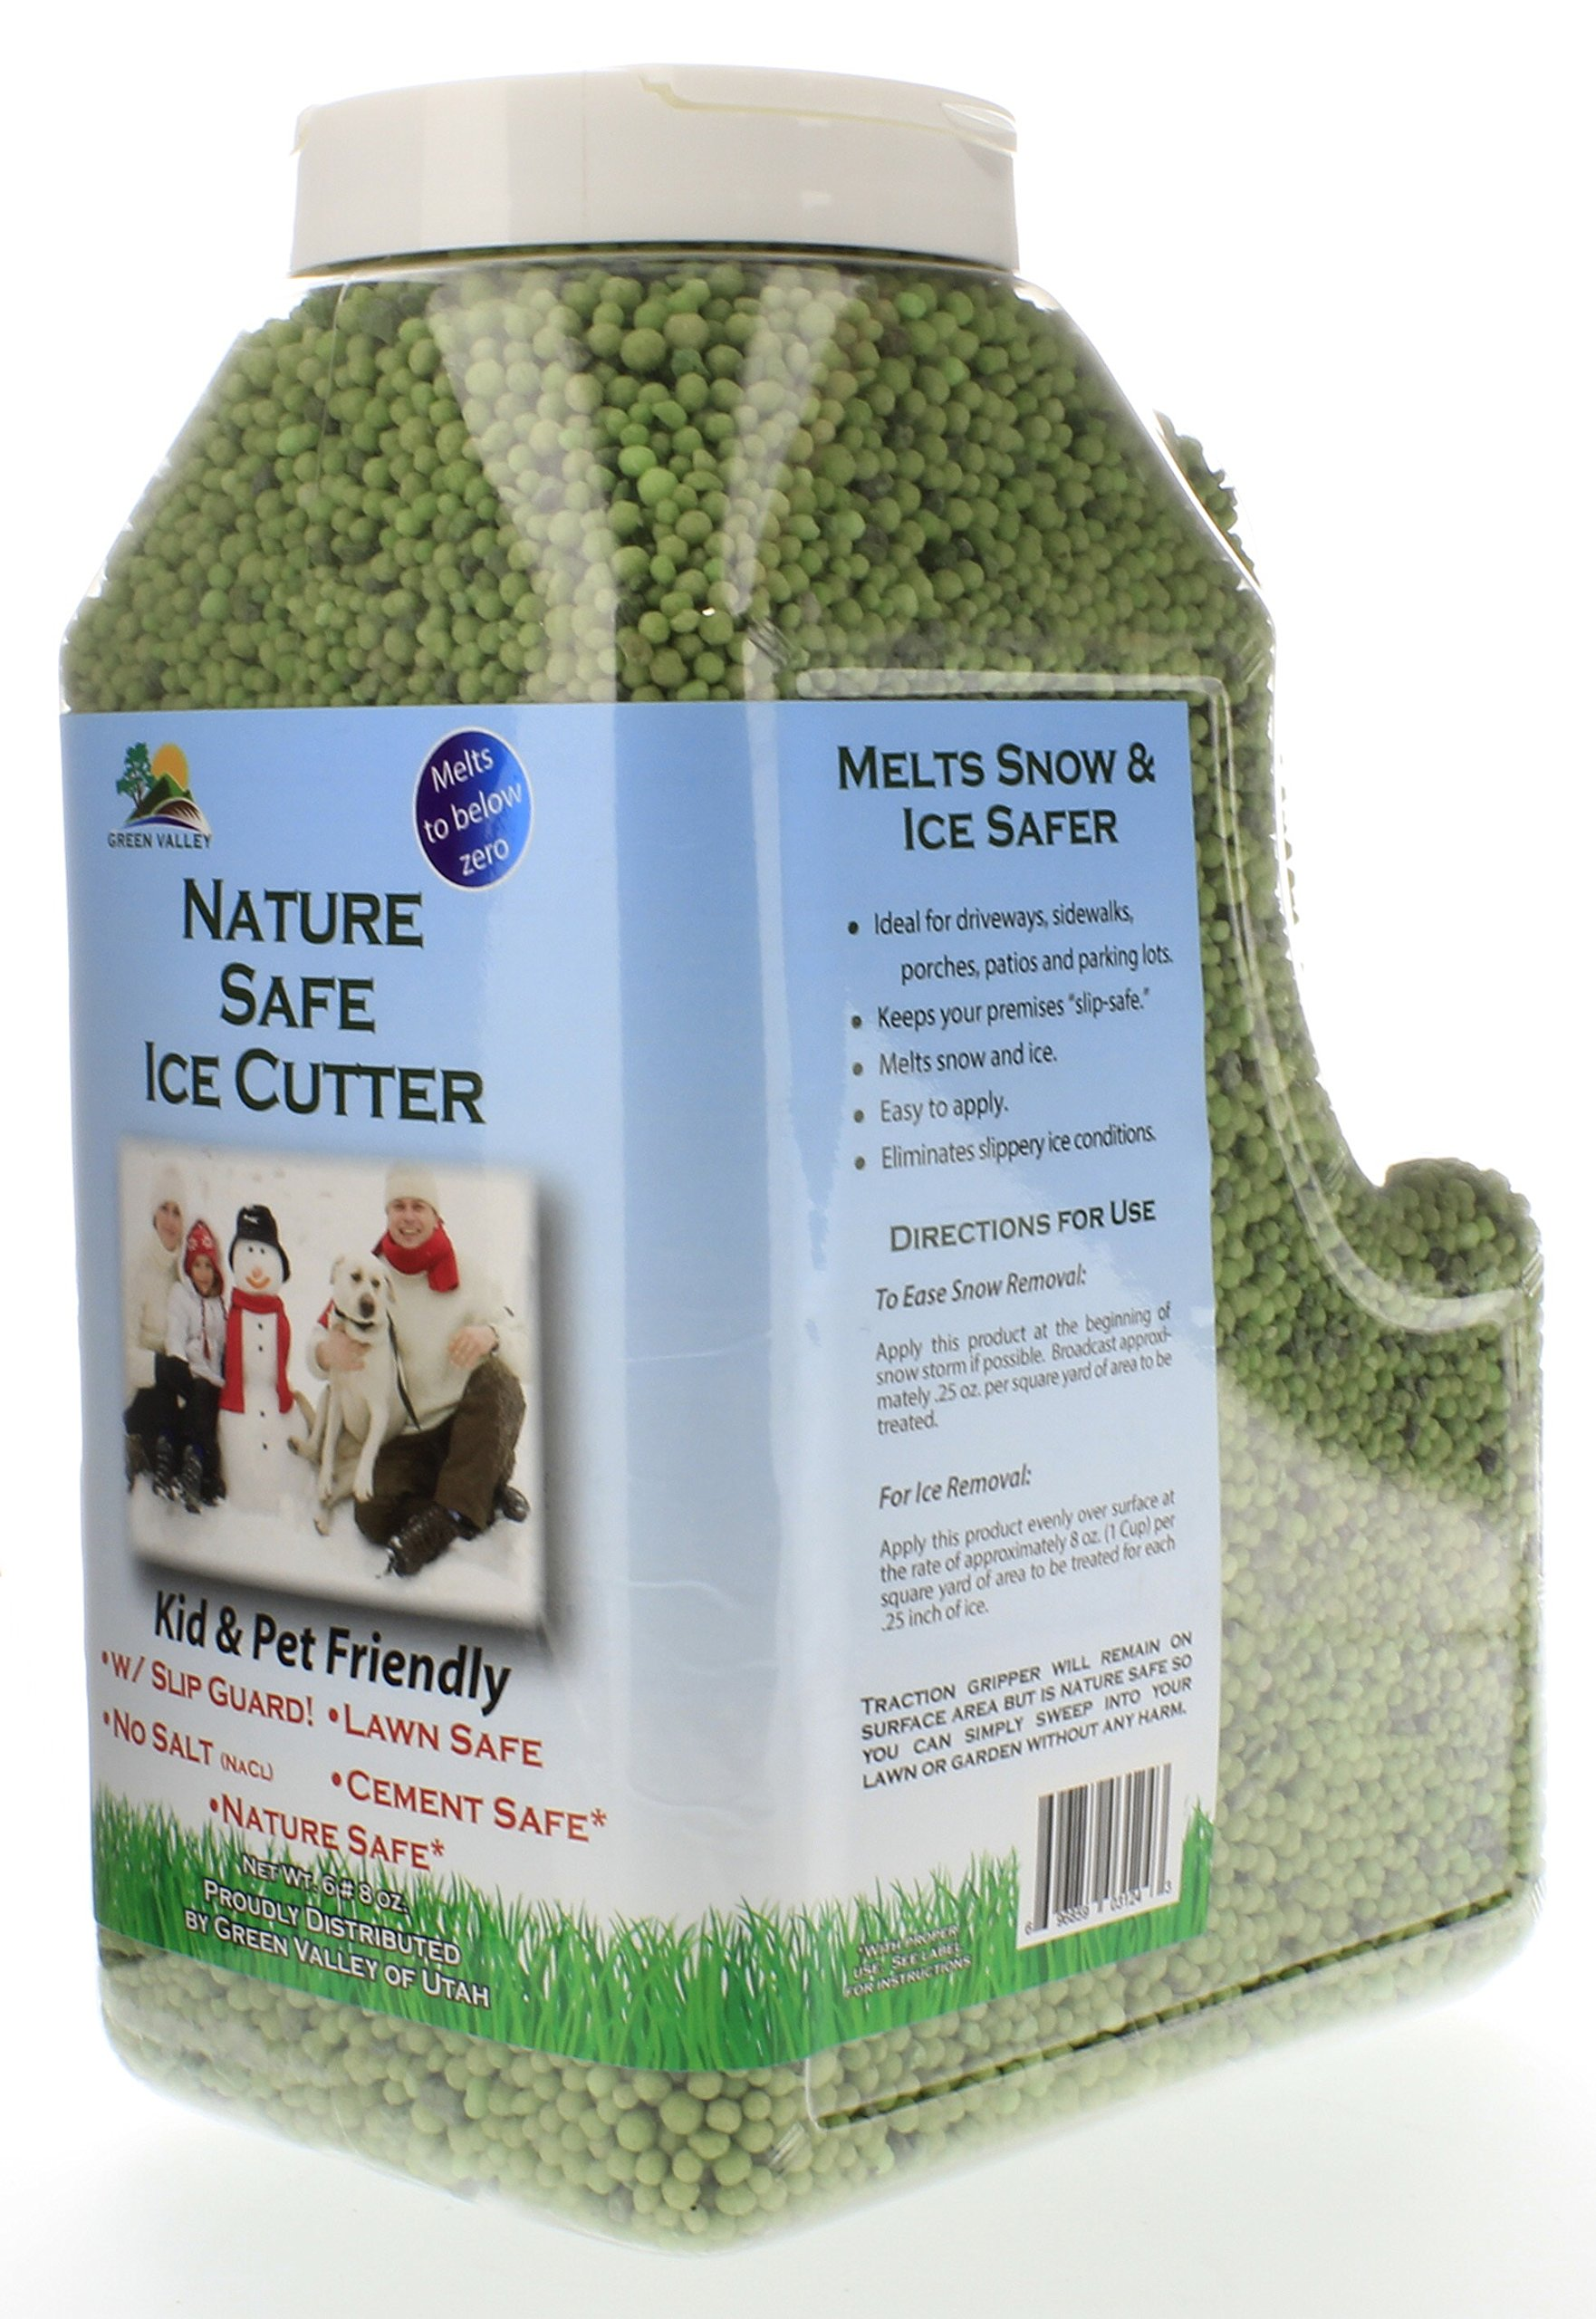 Green Valley Earth Nature Safe Organic Ice Melt Non-Toxic Pet Safe - 1 Gallon